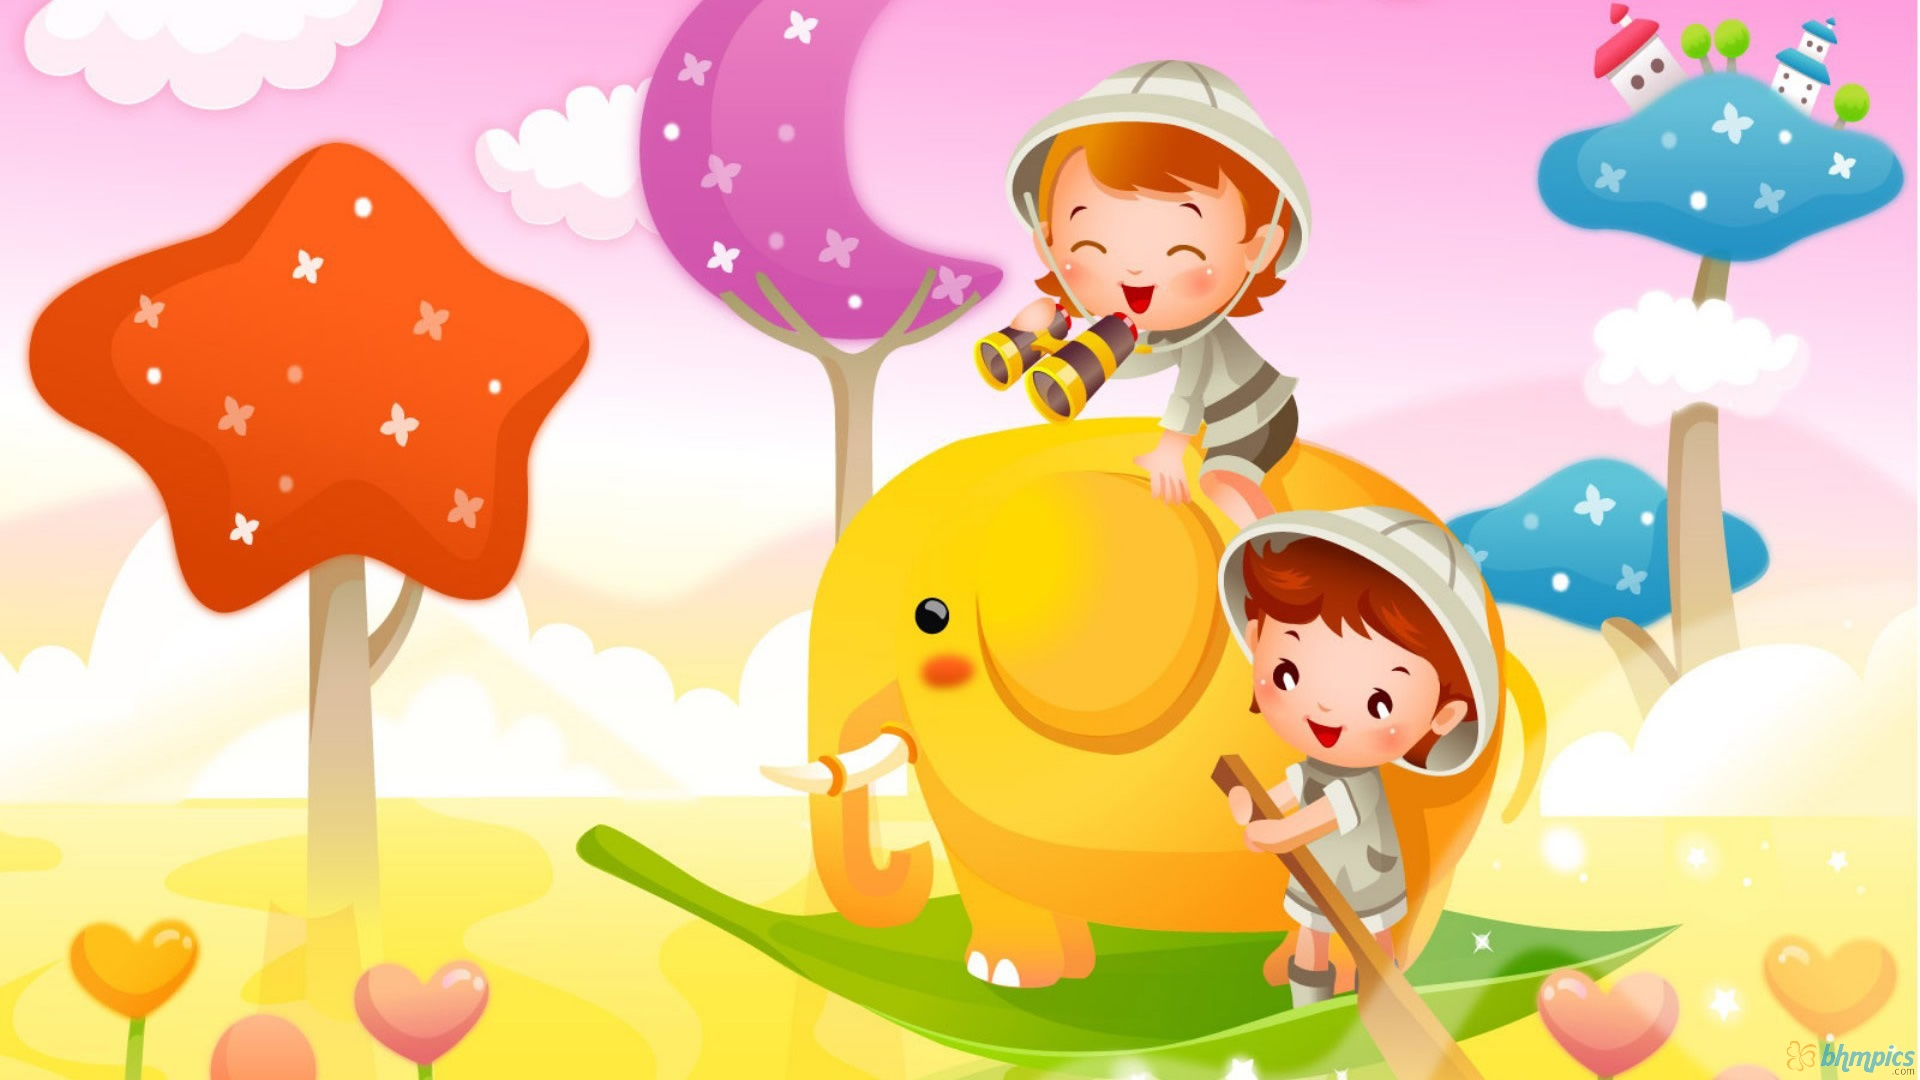 Cartoon Backgrounds Cute 1920x1080